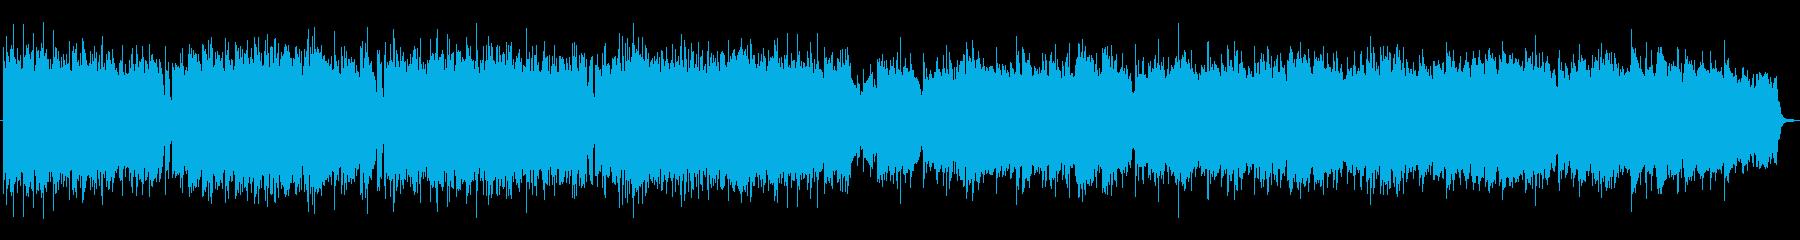 Brain Destruction60秒の再生済みの波形